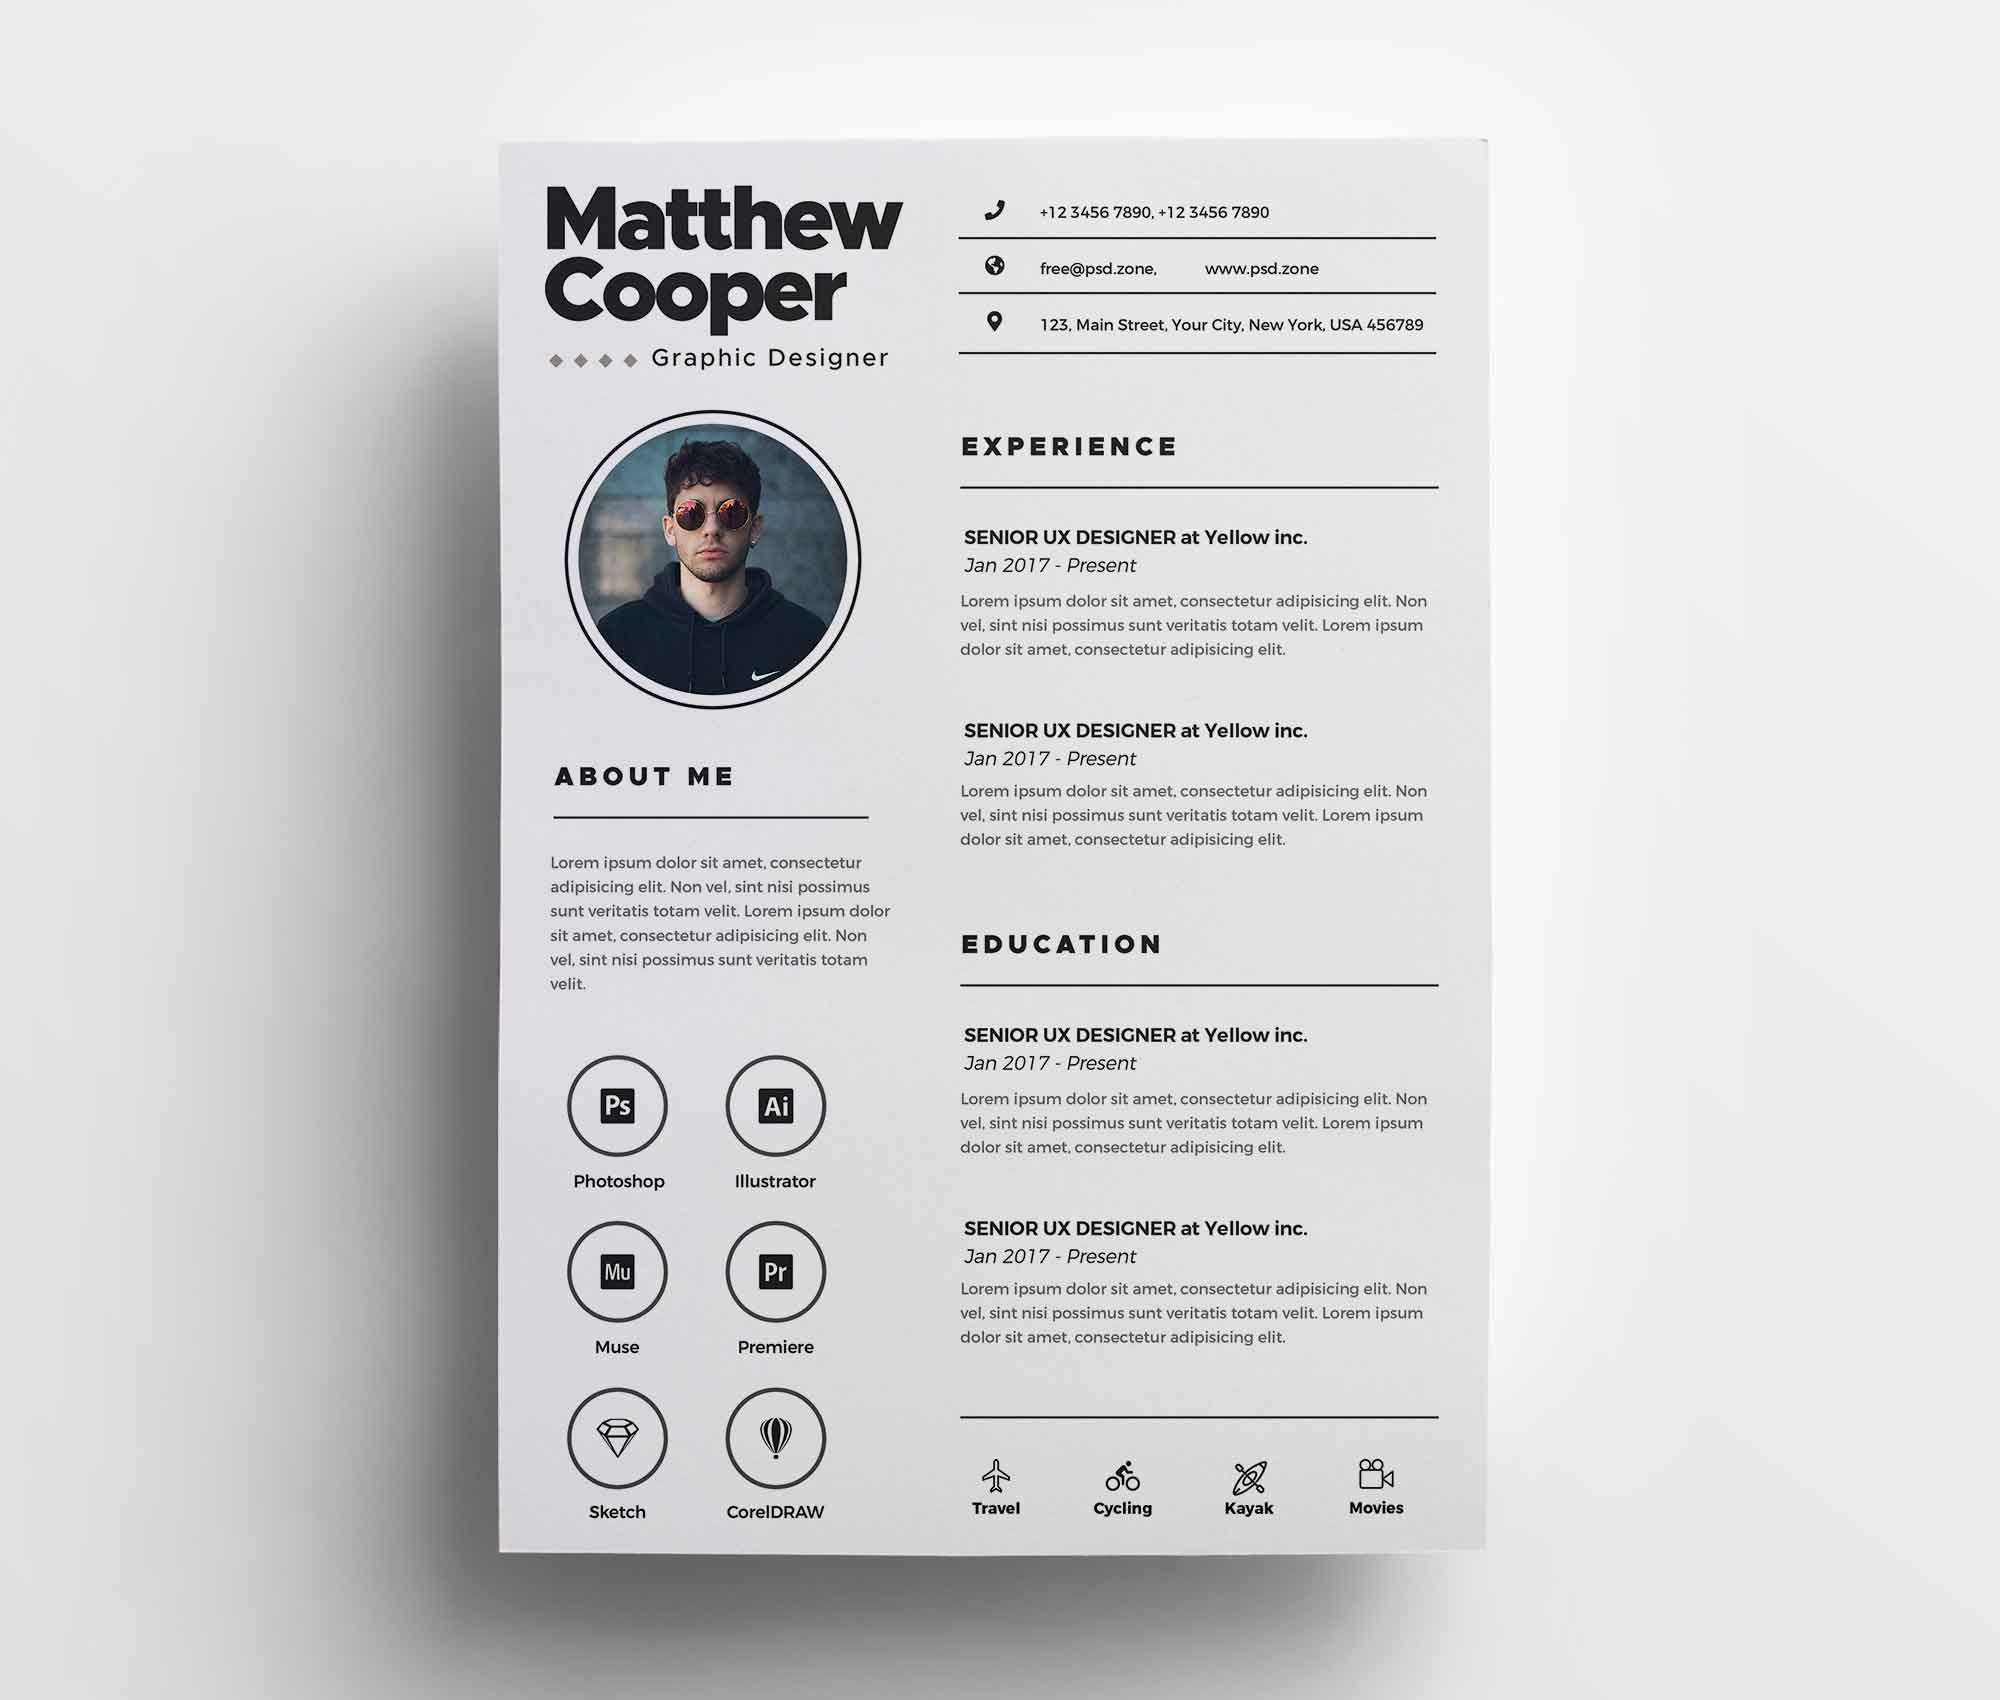 003 Stunning Cv Design Photoshop Template Free Idea  Resume Psd DownloadFull